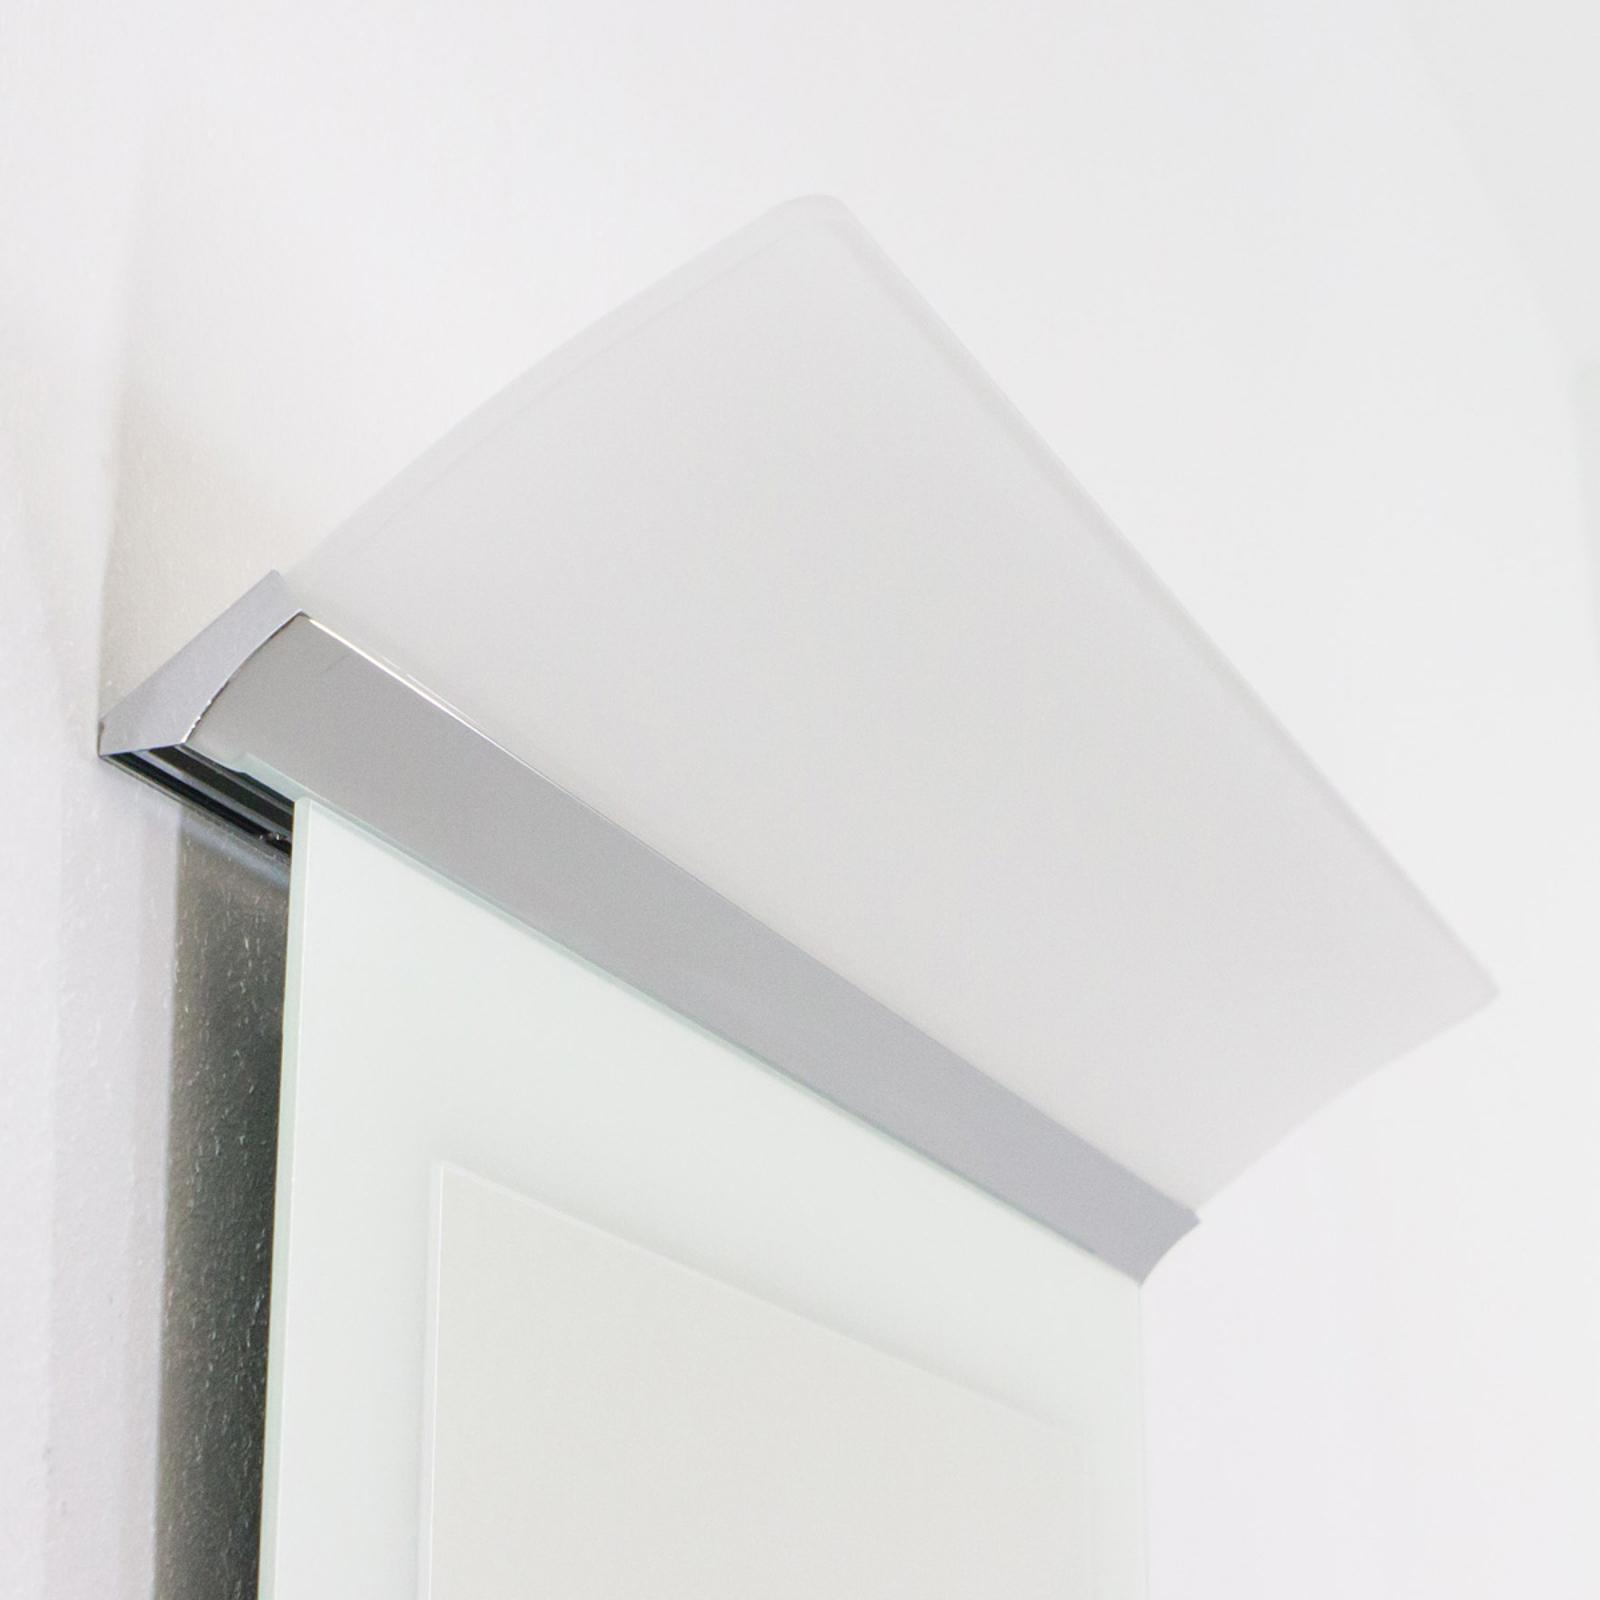 Bredd LED-spegellampa Angela, IP44, 50 cm